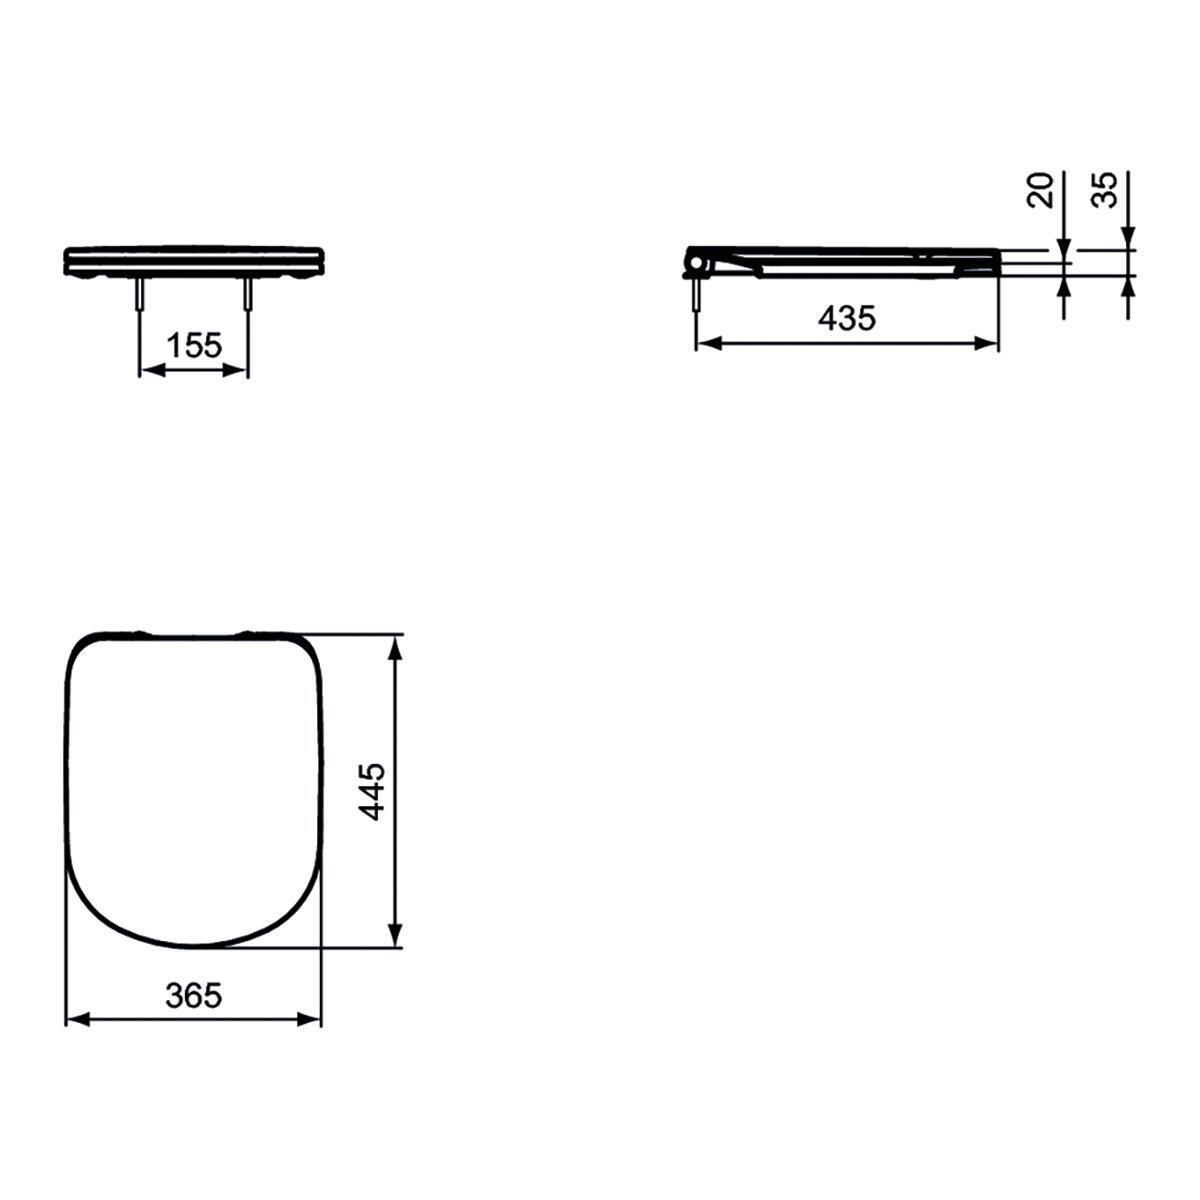 Copriwater ovale Originale per serie sanitari Gemma 2 IDEAL STANDARD termoindurente bianco - 5